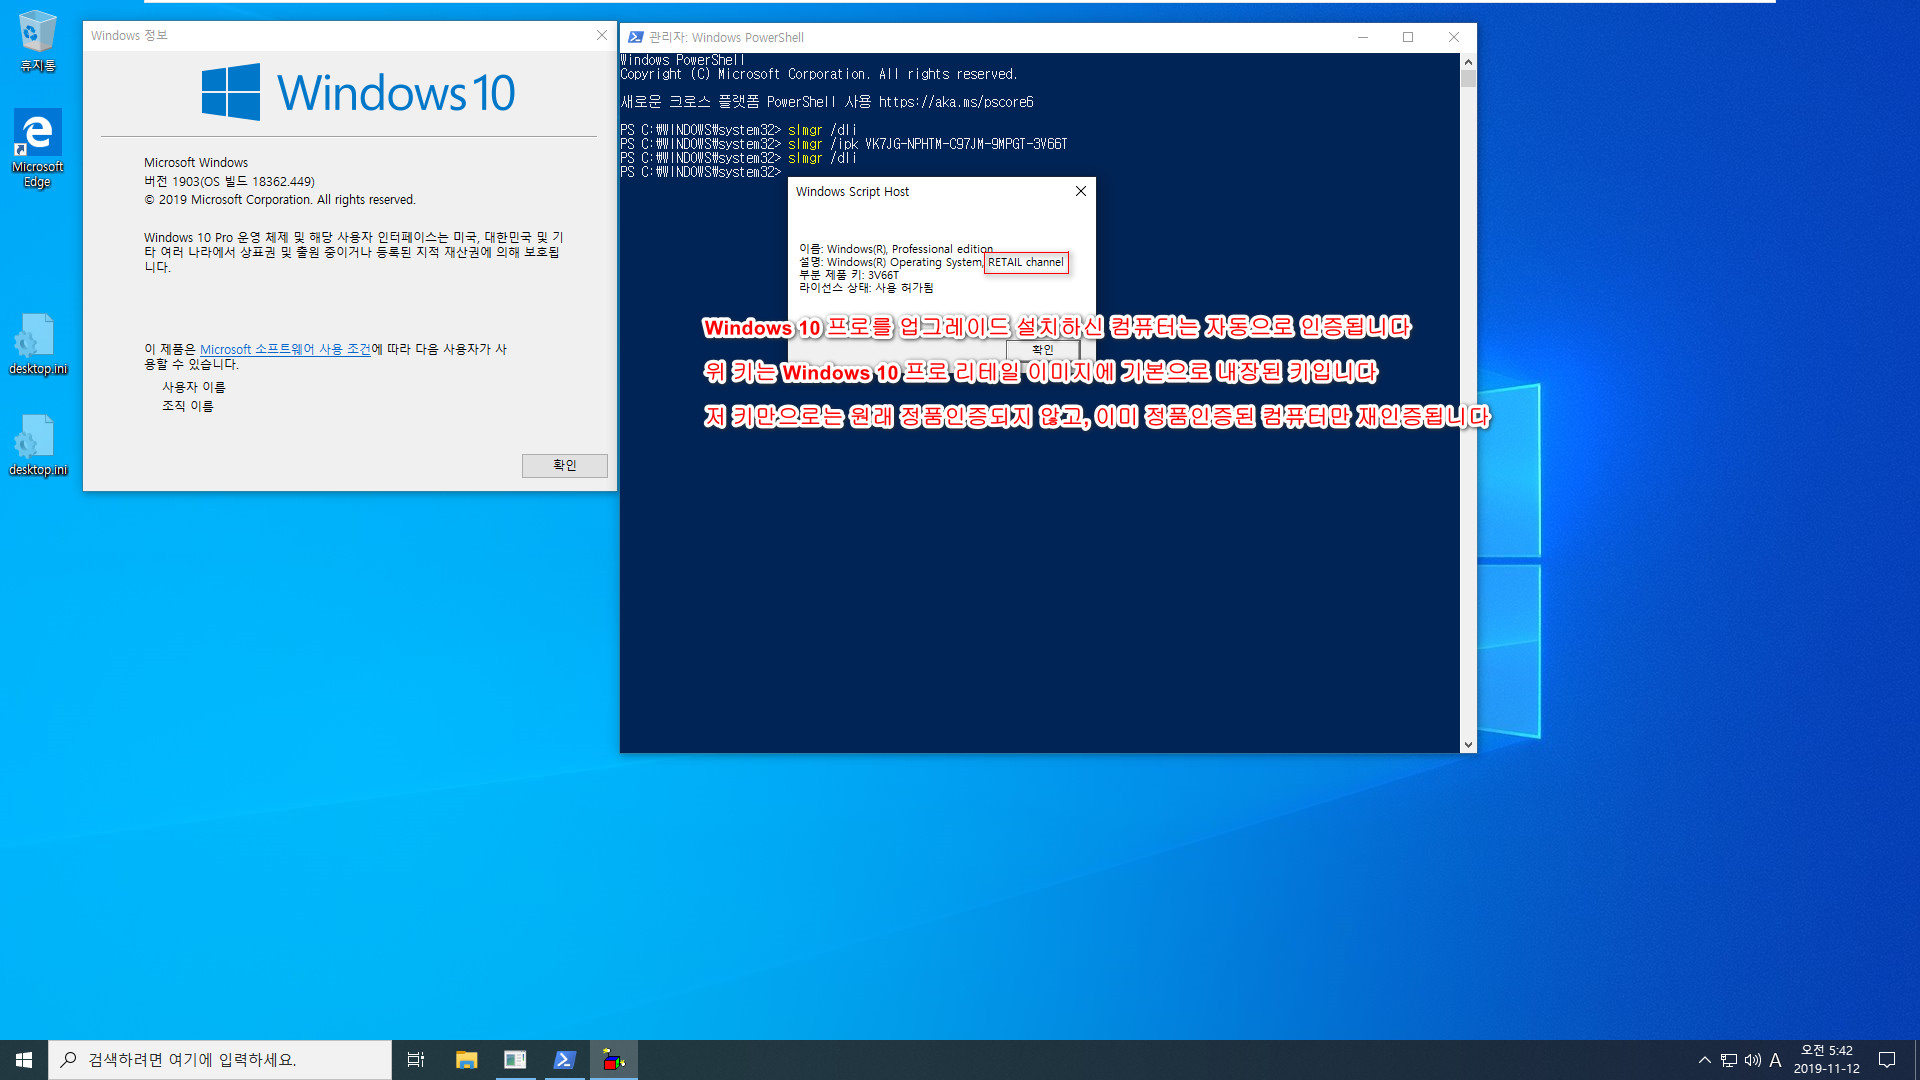 Windows 10 Enterprise LTSC [2019] (버전 1809) 를 버전 1903 프로로 업그레이드 설치하기 - 우선 설정과 앱 유지를 위해서 버전 1903 Enterprise로 업그레이드 한 후에 버전 1903 Pro로 변경하면 됩니다 2019-11-12_054217.jpg